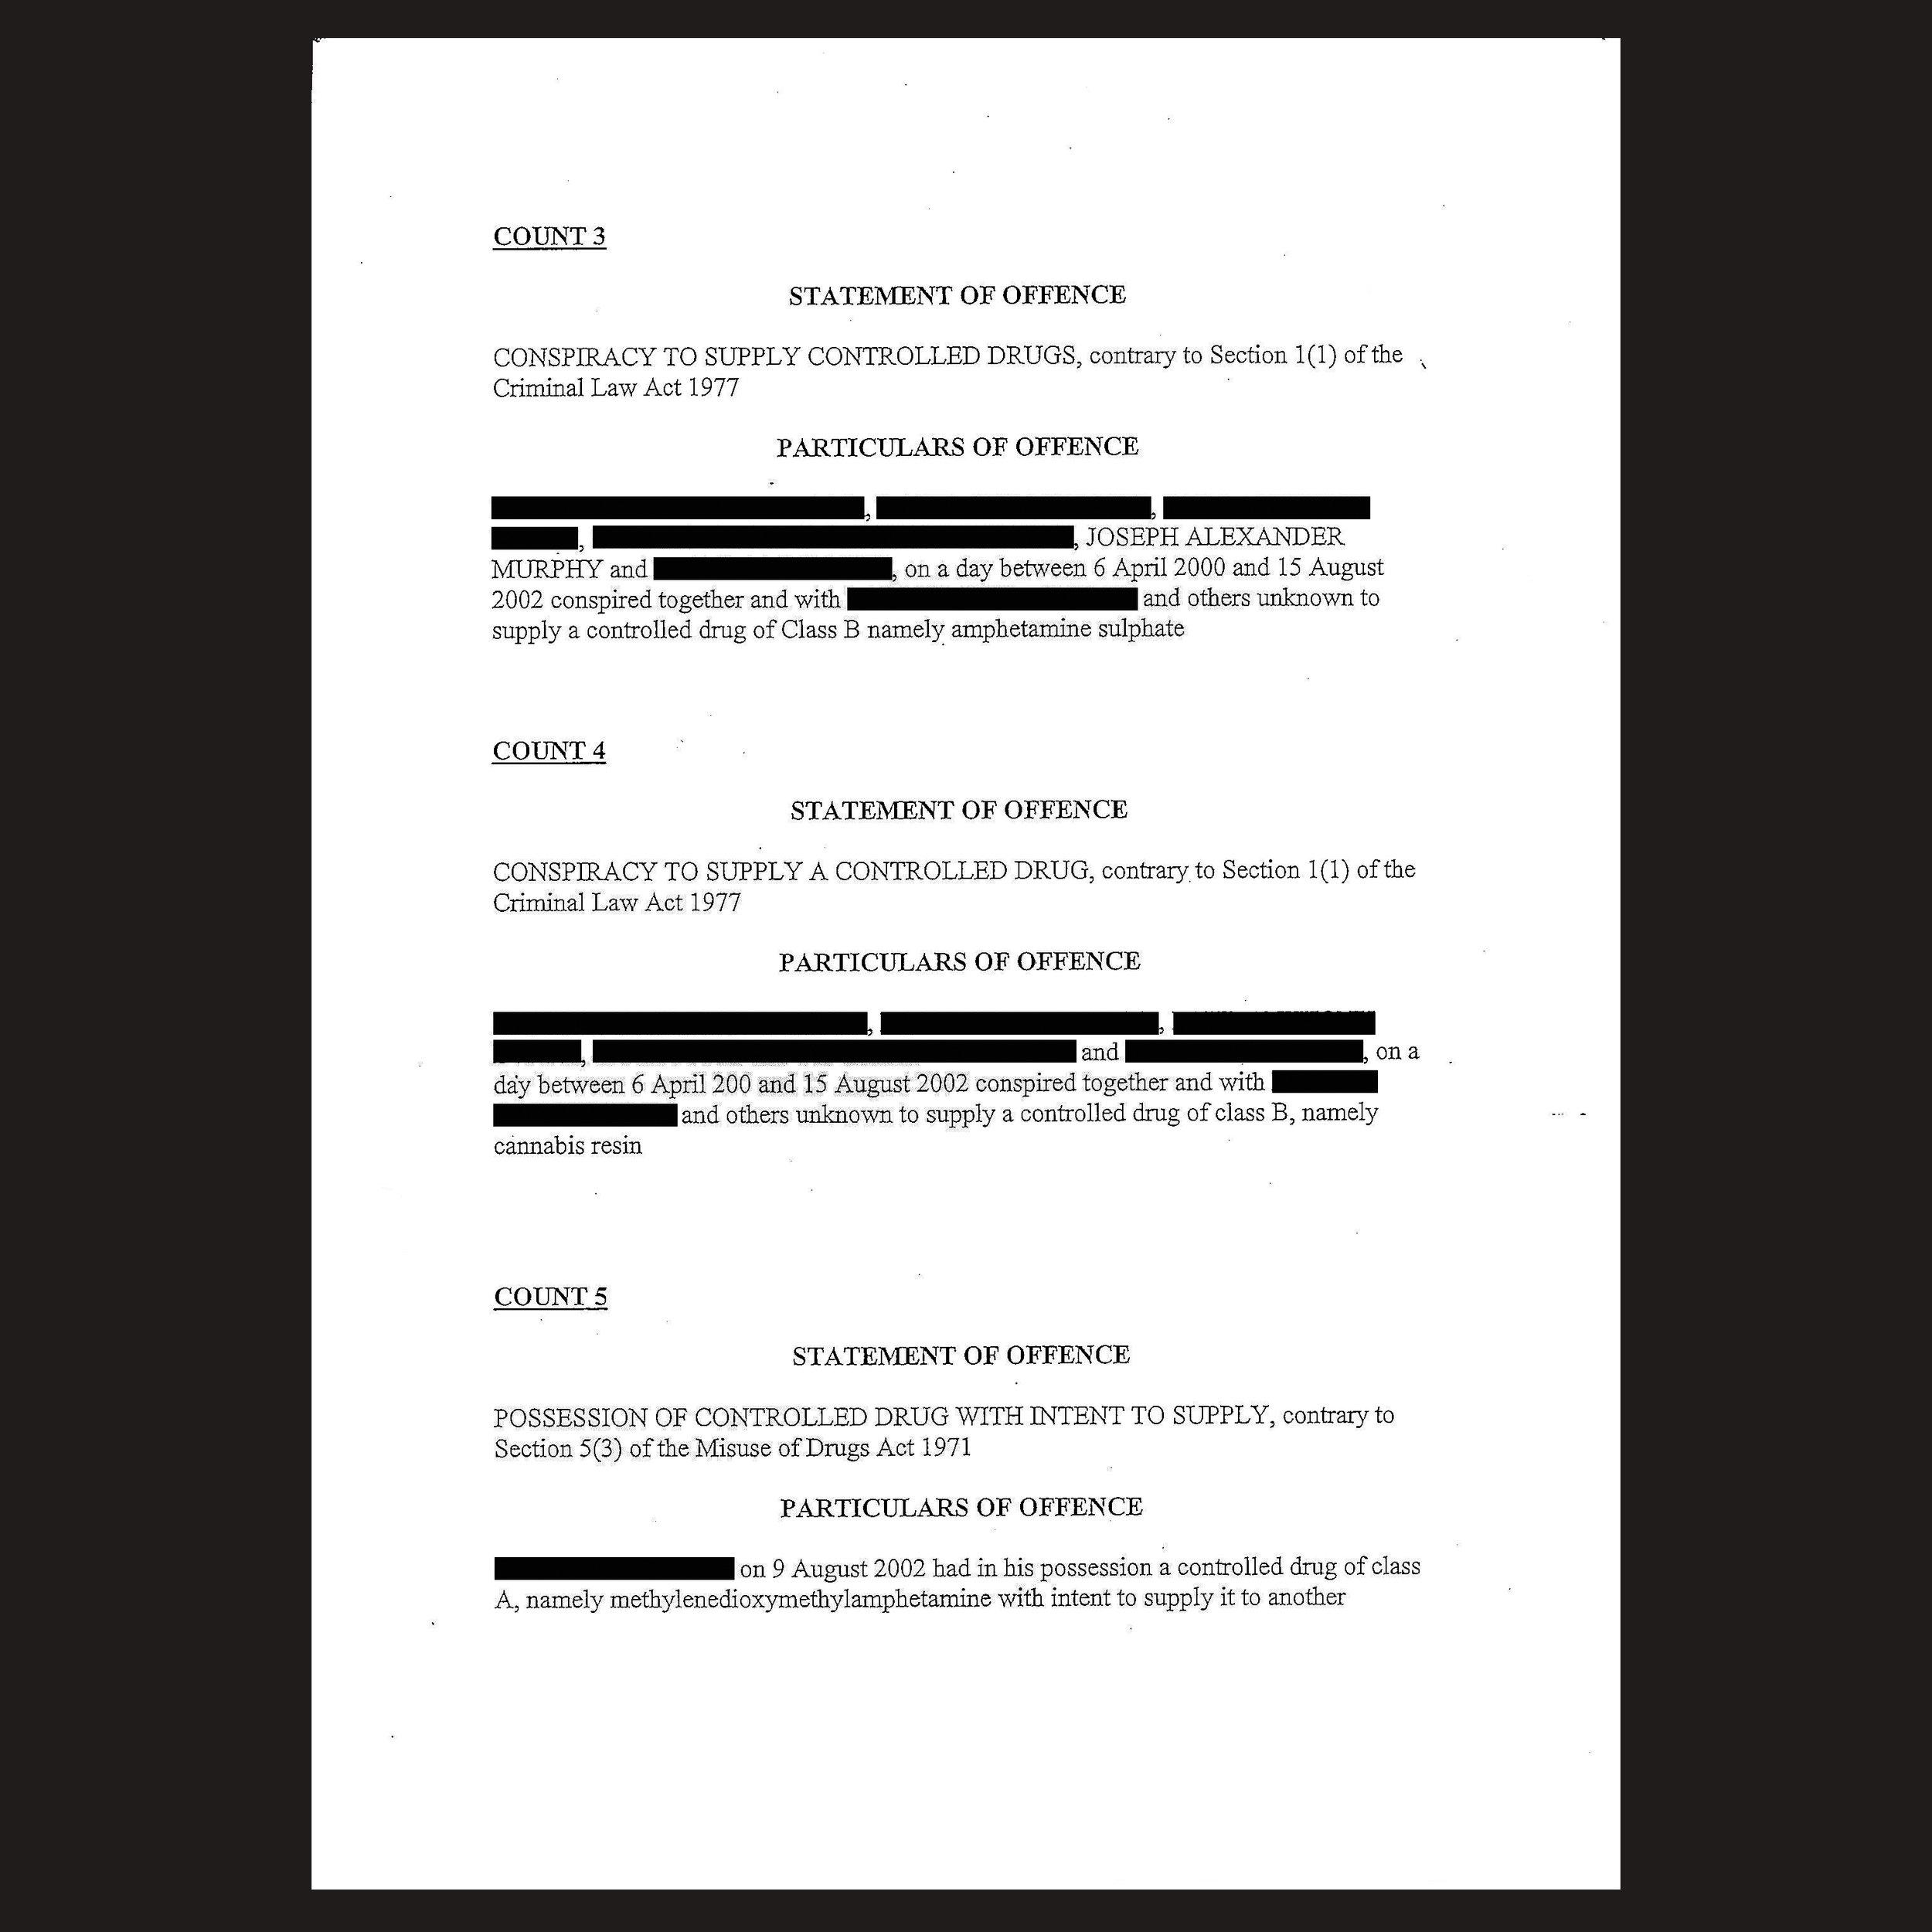 JM Bail 134 - Court Statement of Offences - Part 2.jpg